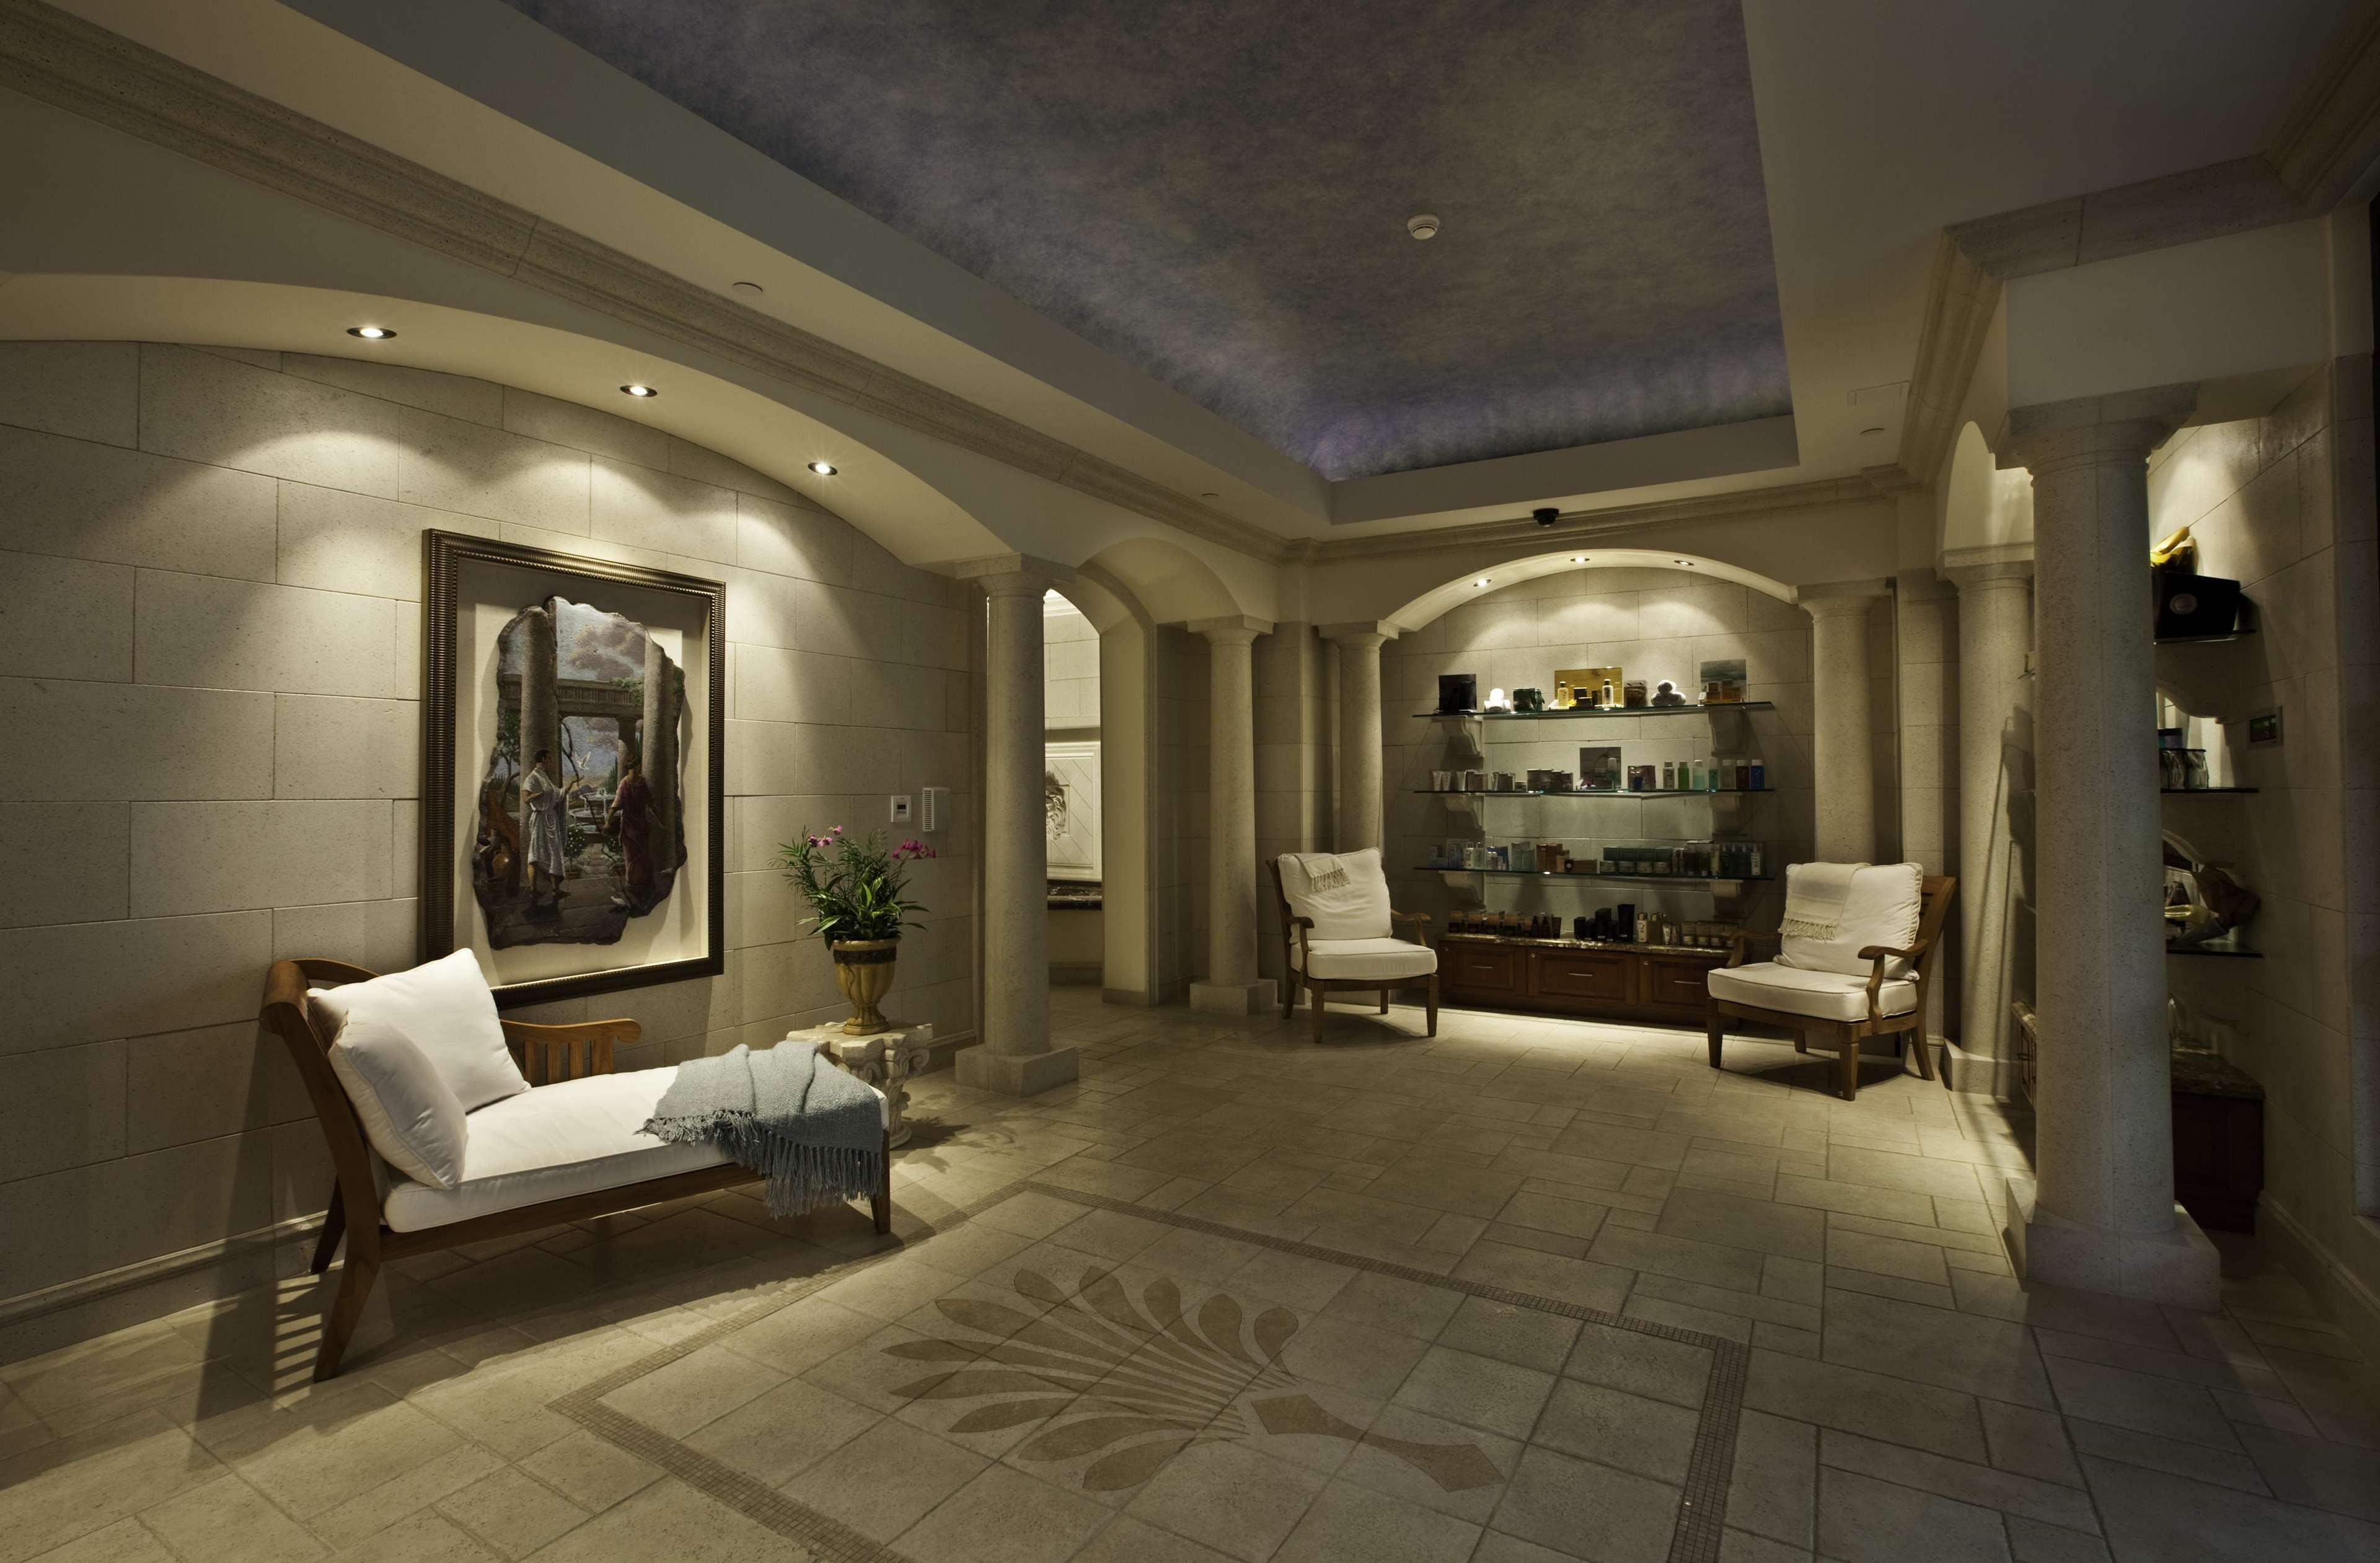 Hilton Marco Island Beach Resort and Spa